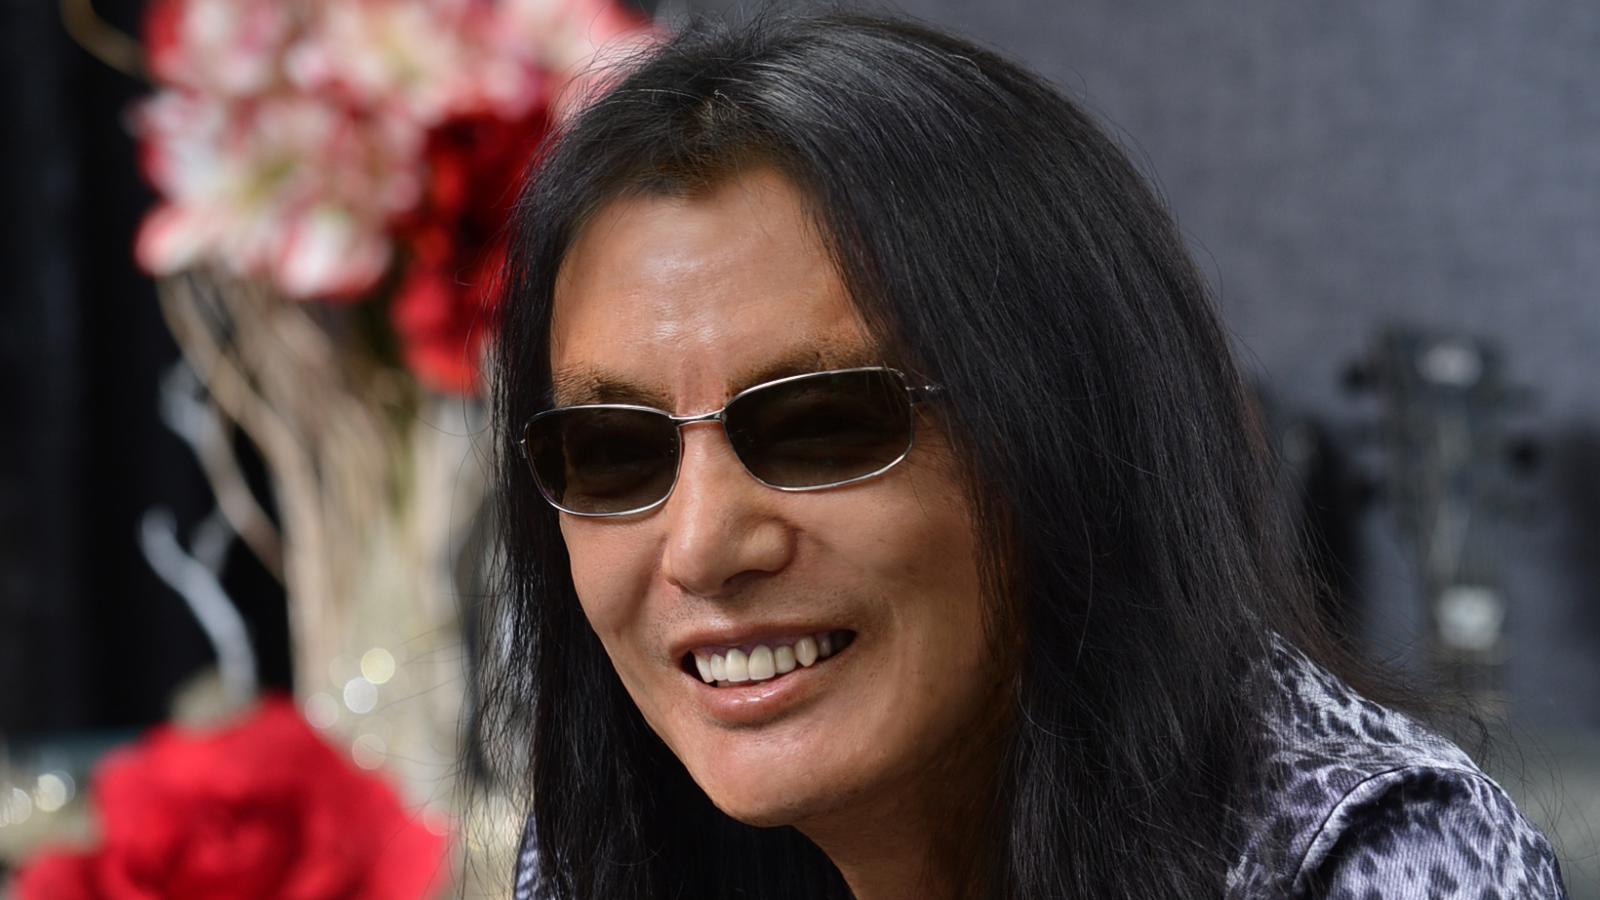 Tomonobu Itagaki, twórca Dead or Alive i Ninja Gaiden, zakłada nowe studio